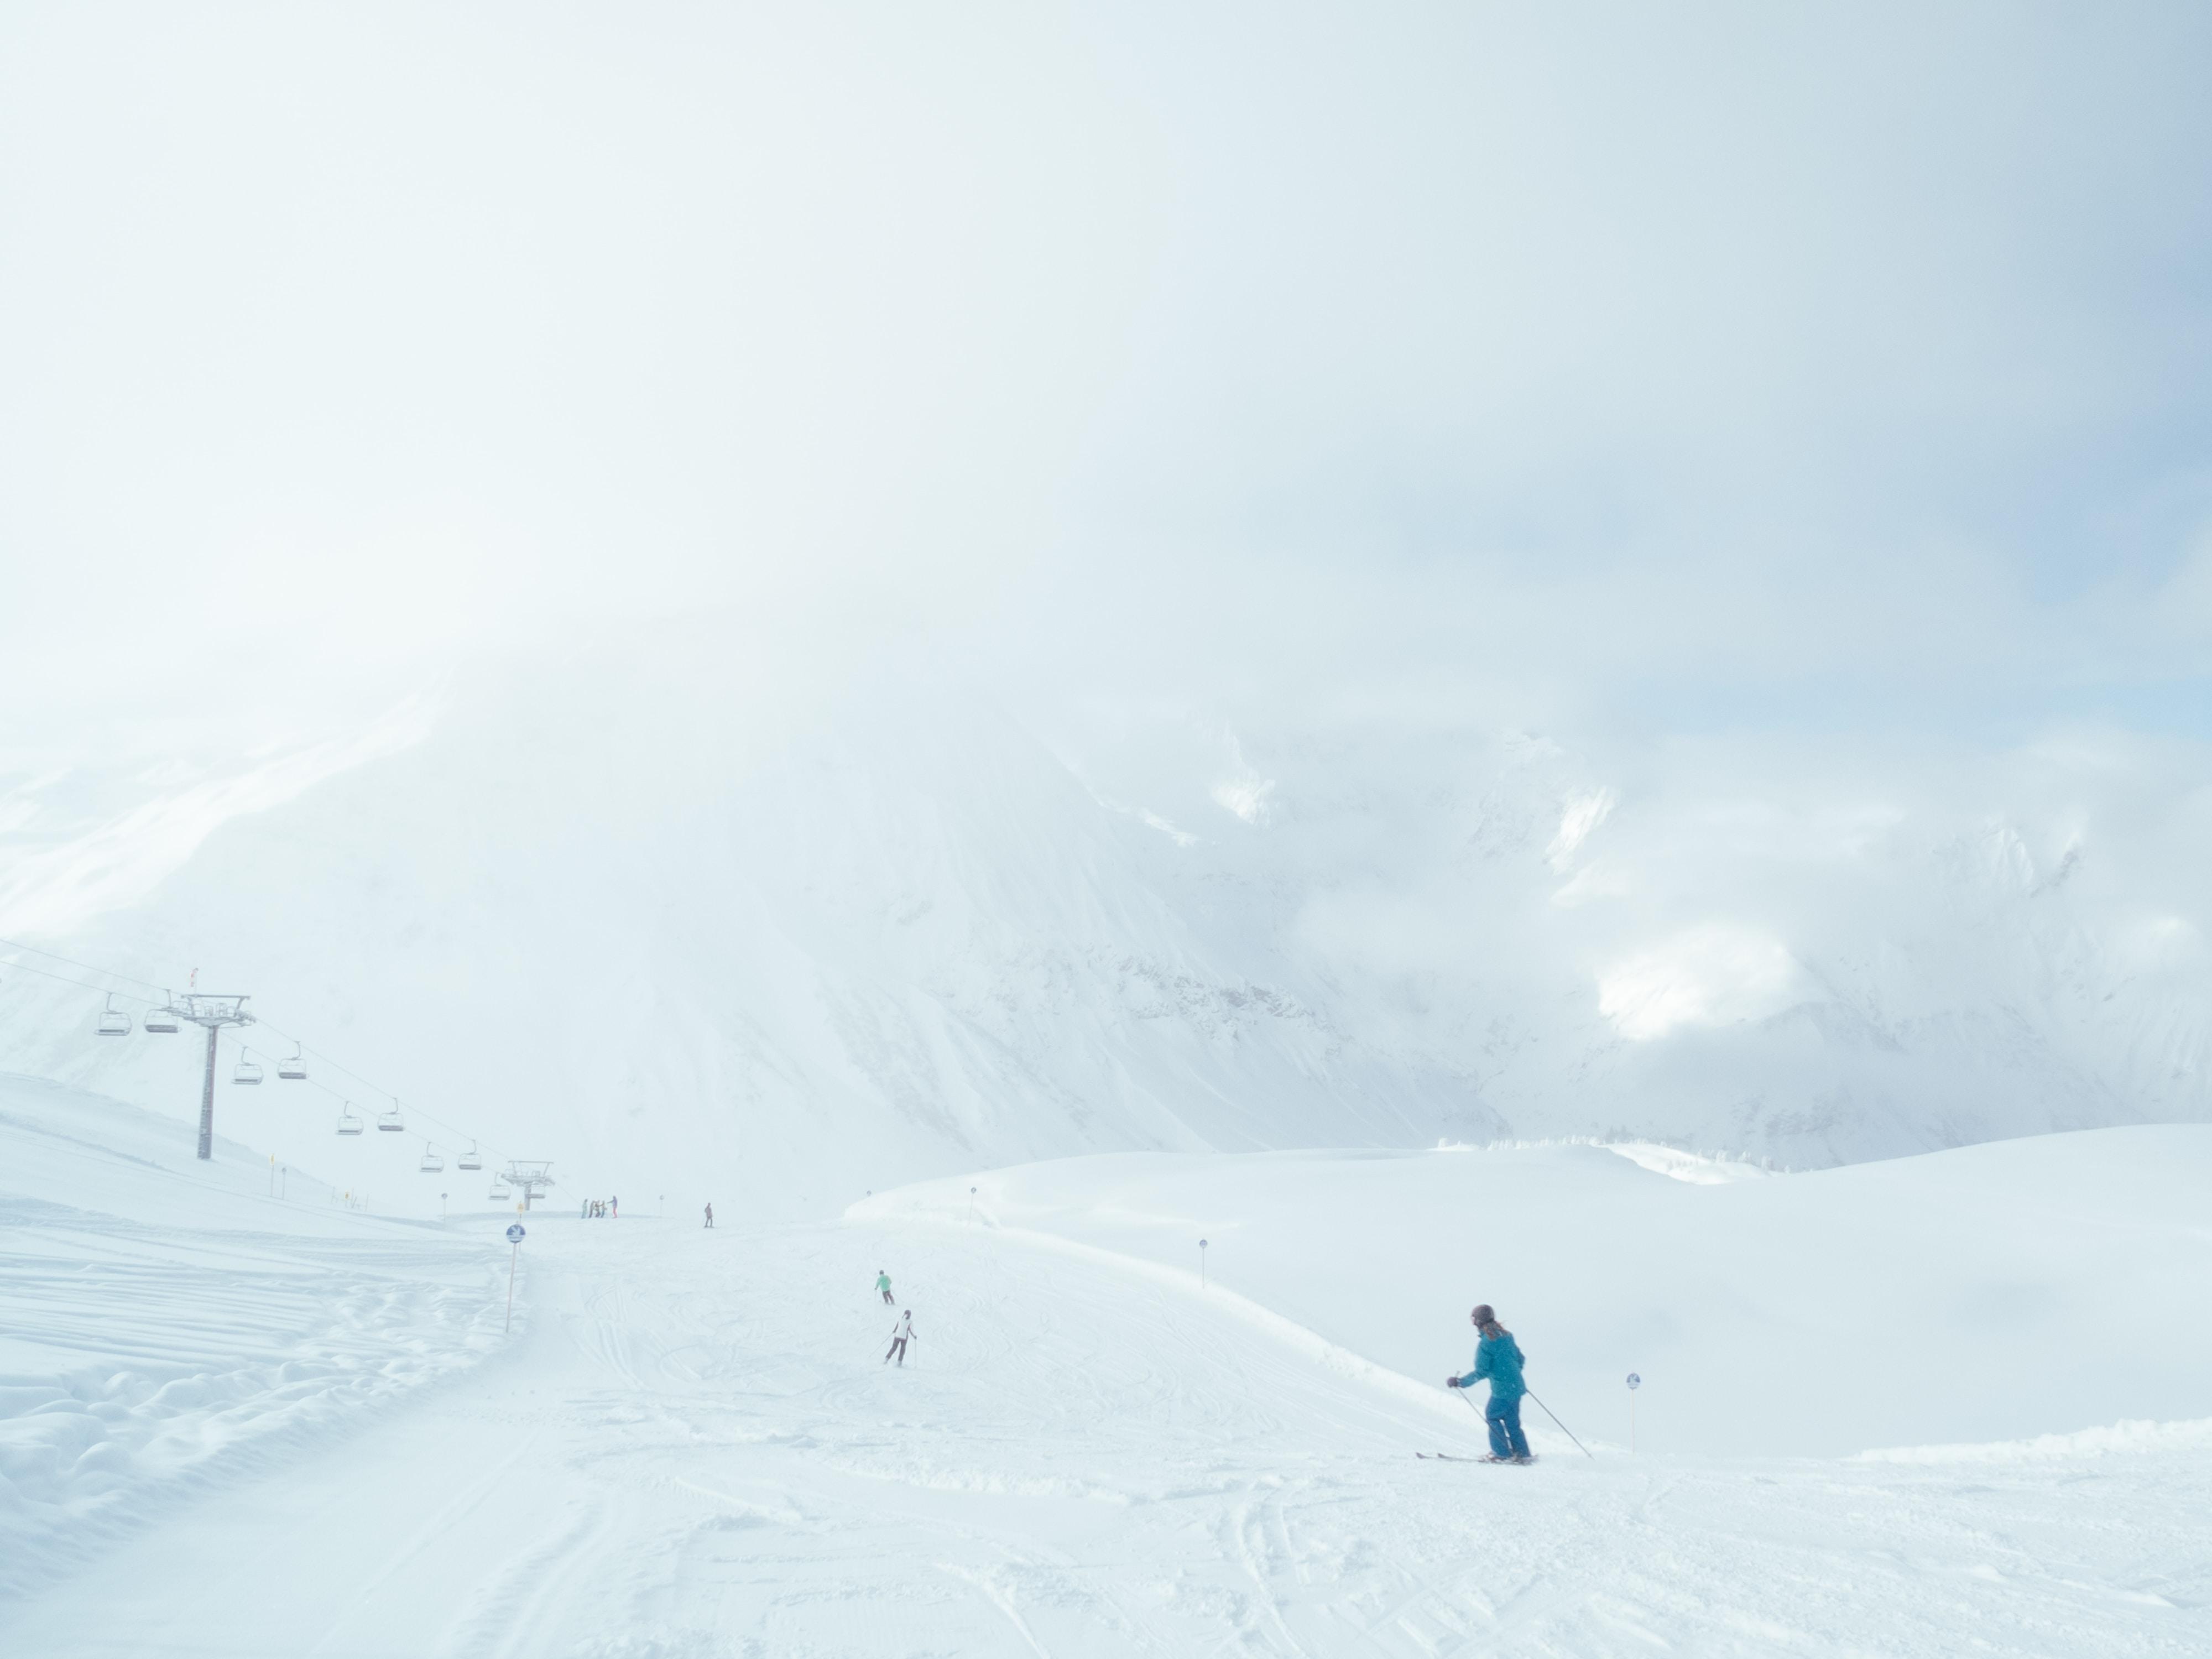 person walking on the snowy field